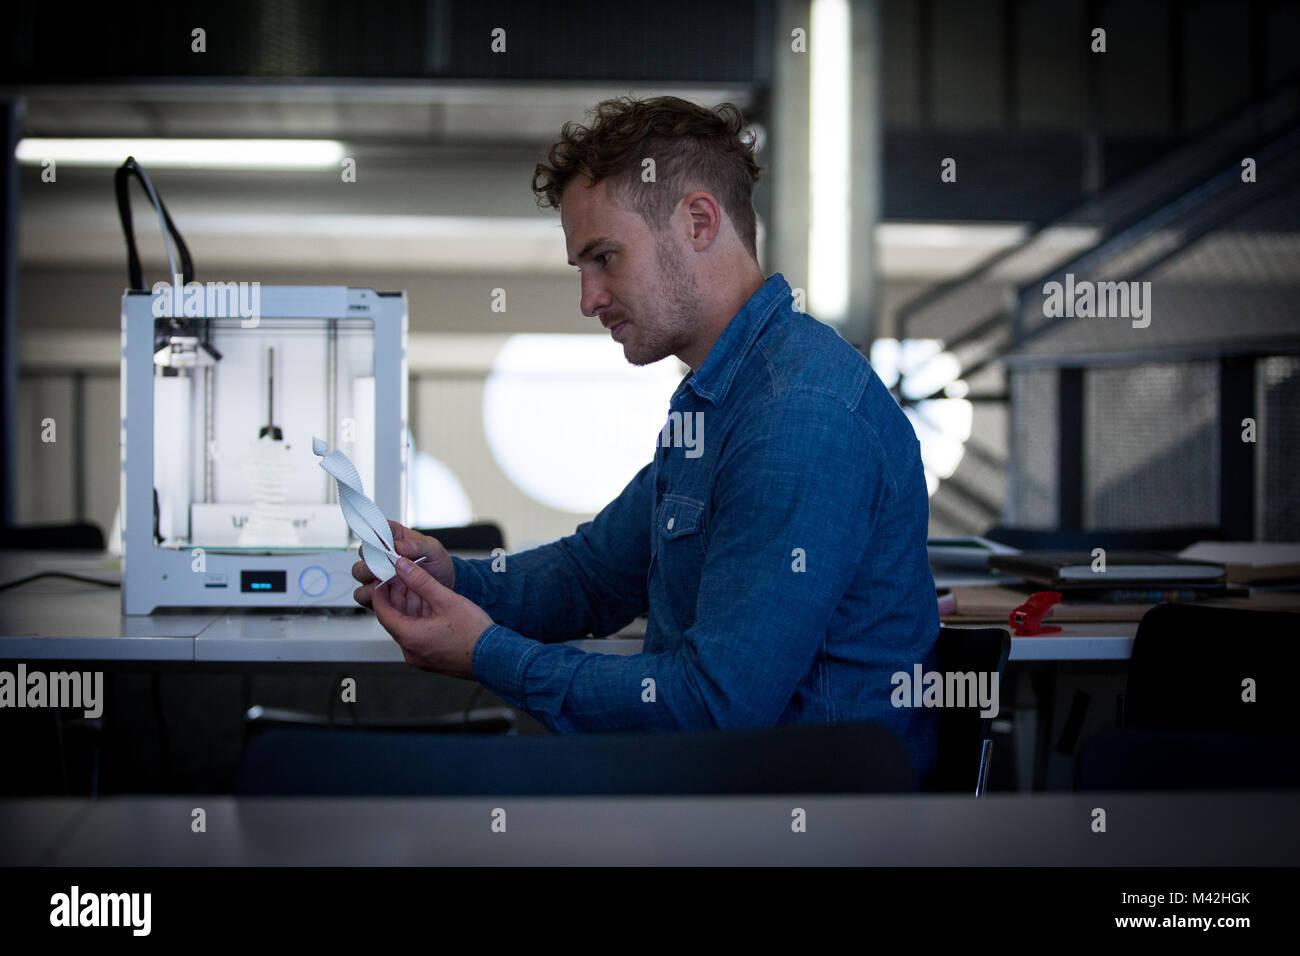 Diseñador con impresora 3D Imagen De Stock